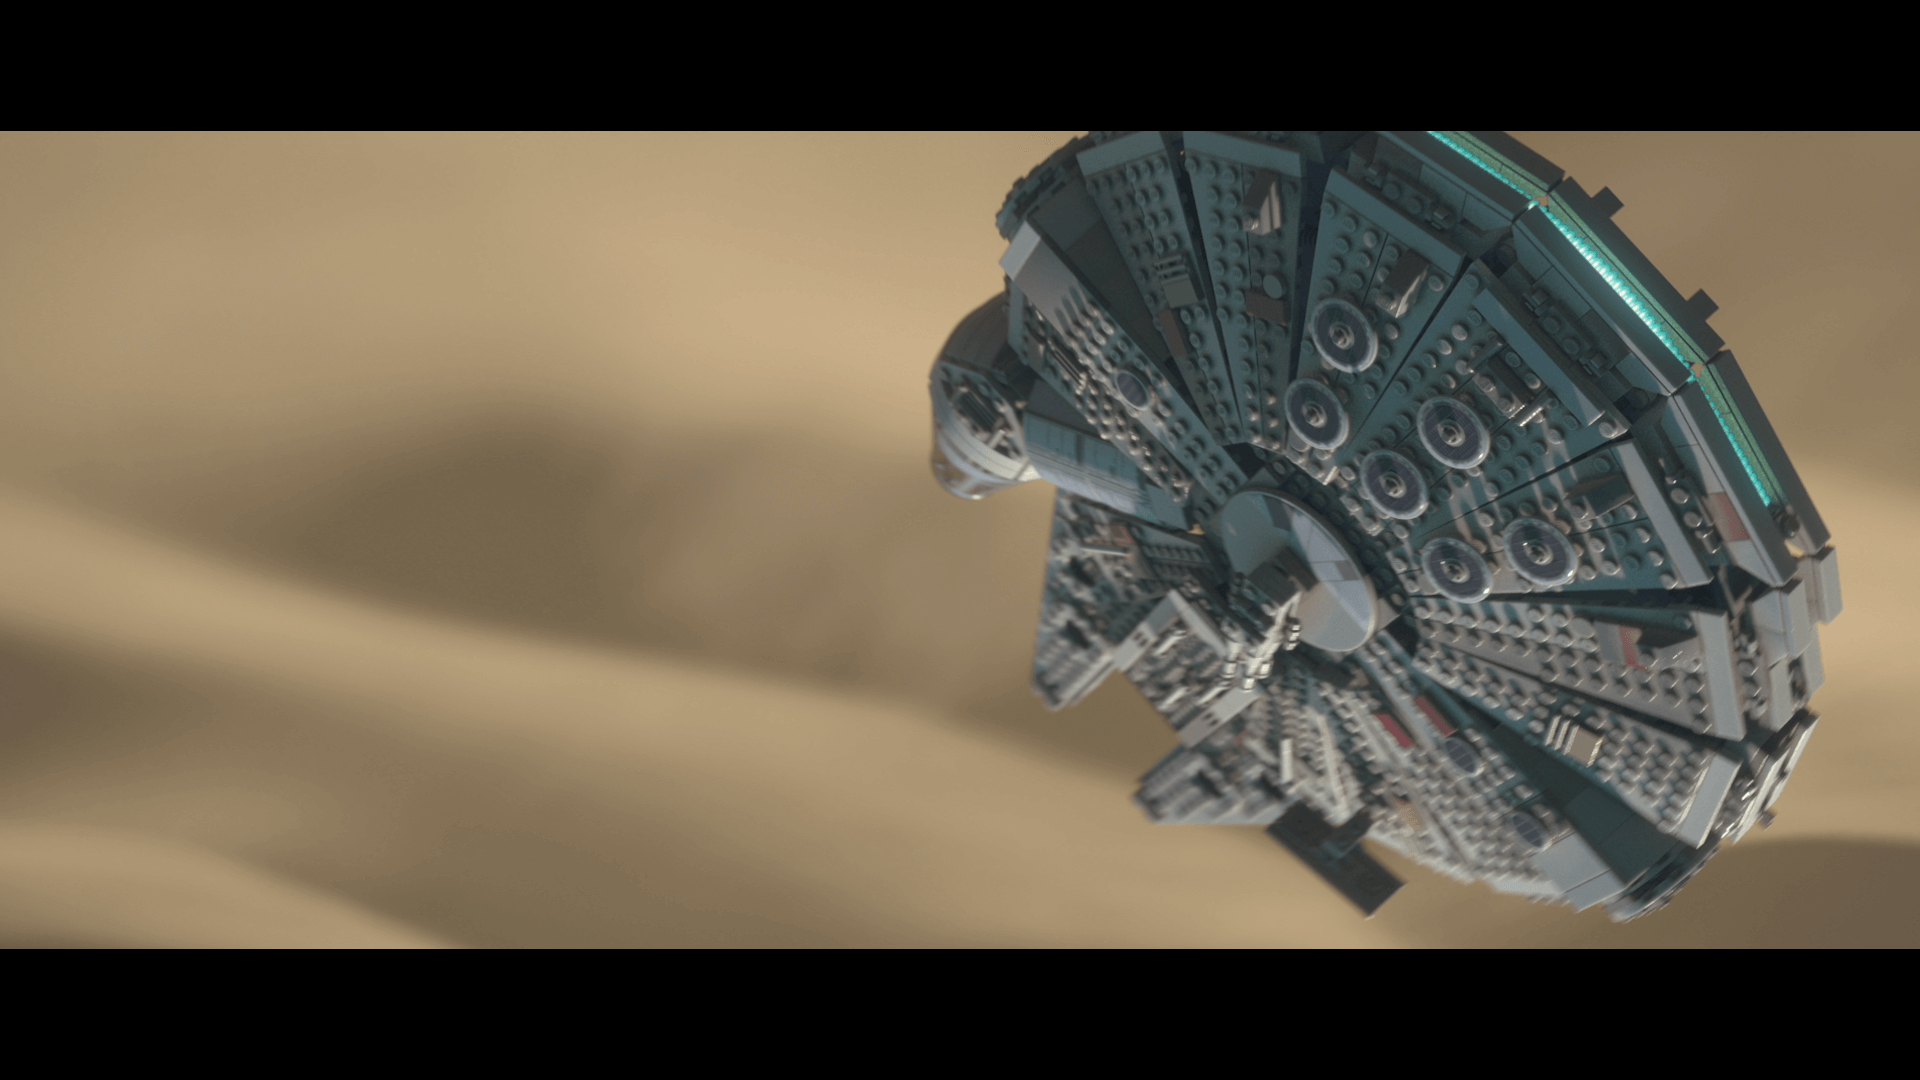 Lego Star Wars: The Force Awakens: Rasender Falke im Sturzflug (Bildrechte: Feral Interactive)